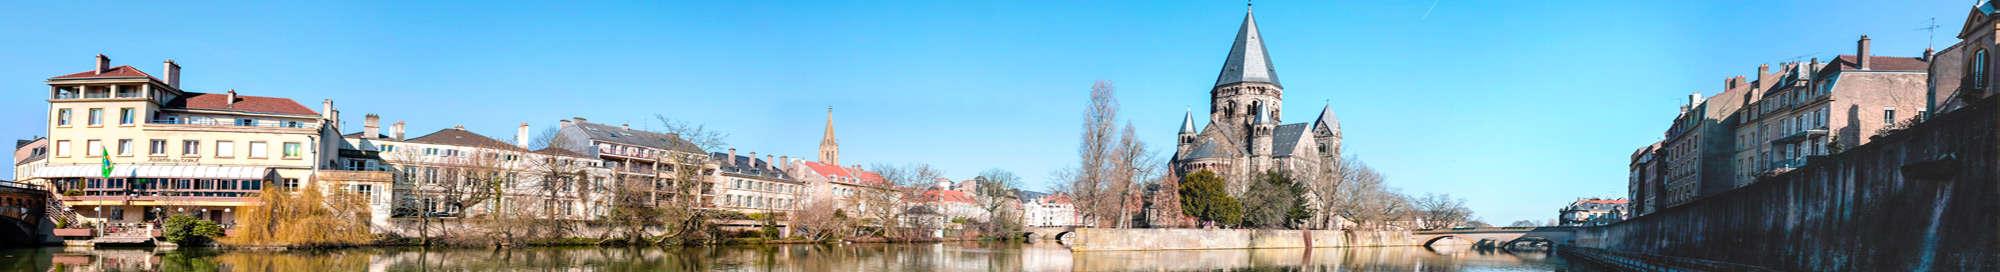 Week-end et séjour en Moselle